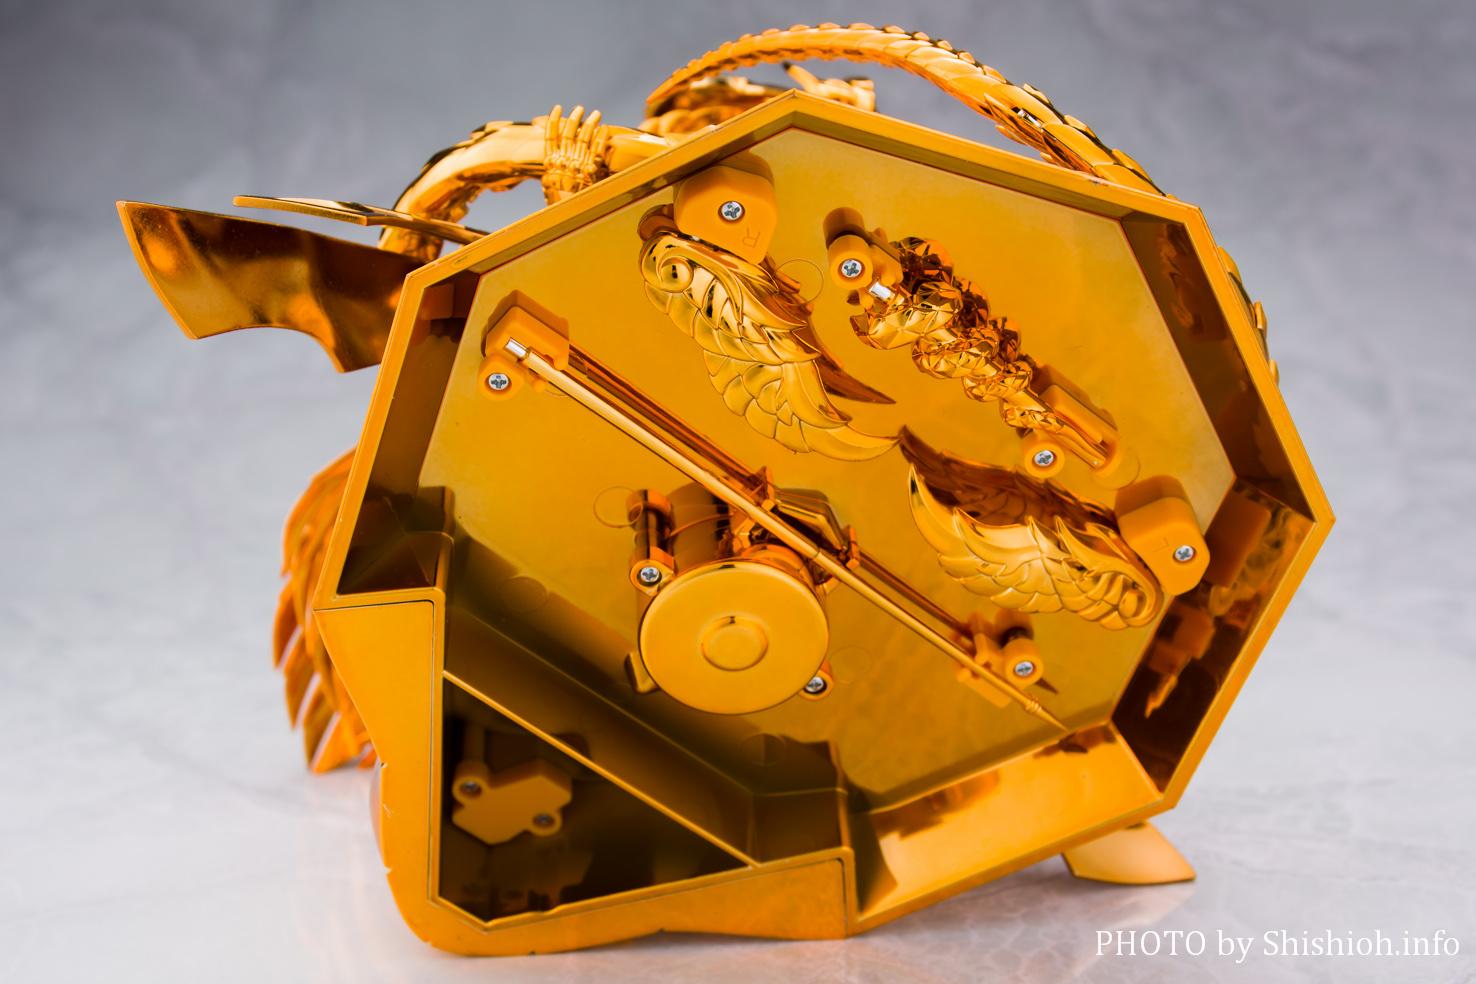 聖闘士聖衣神話EX 十三番目の黄金聖闘士 〜ORIGINAL COLOR EDITION〜